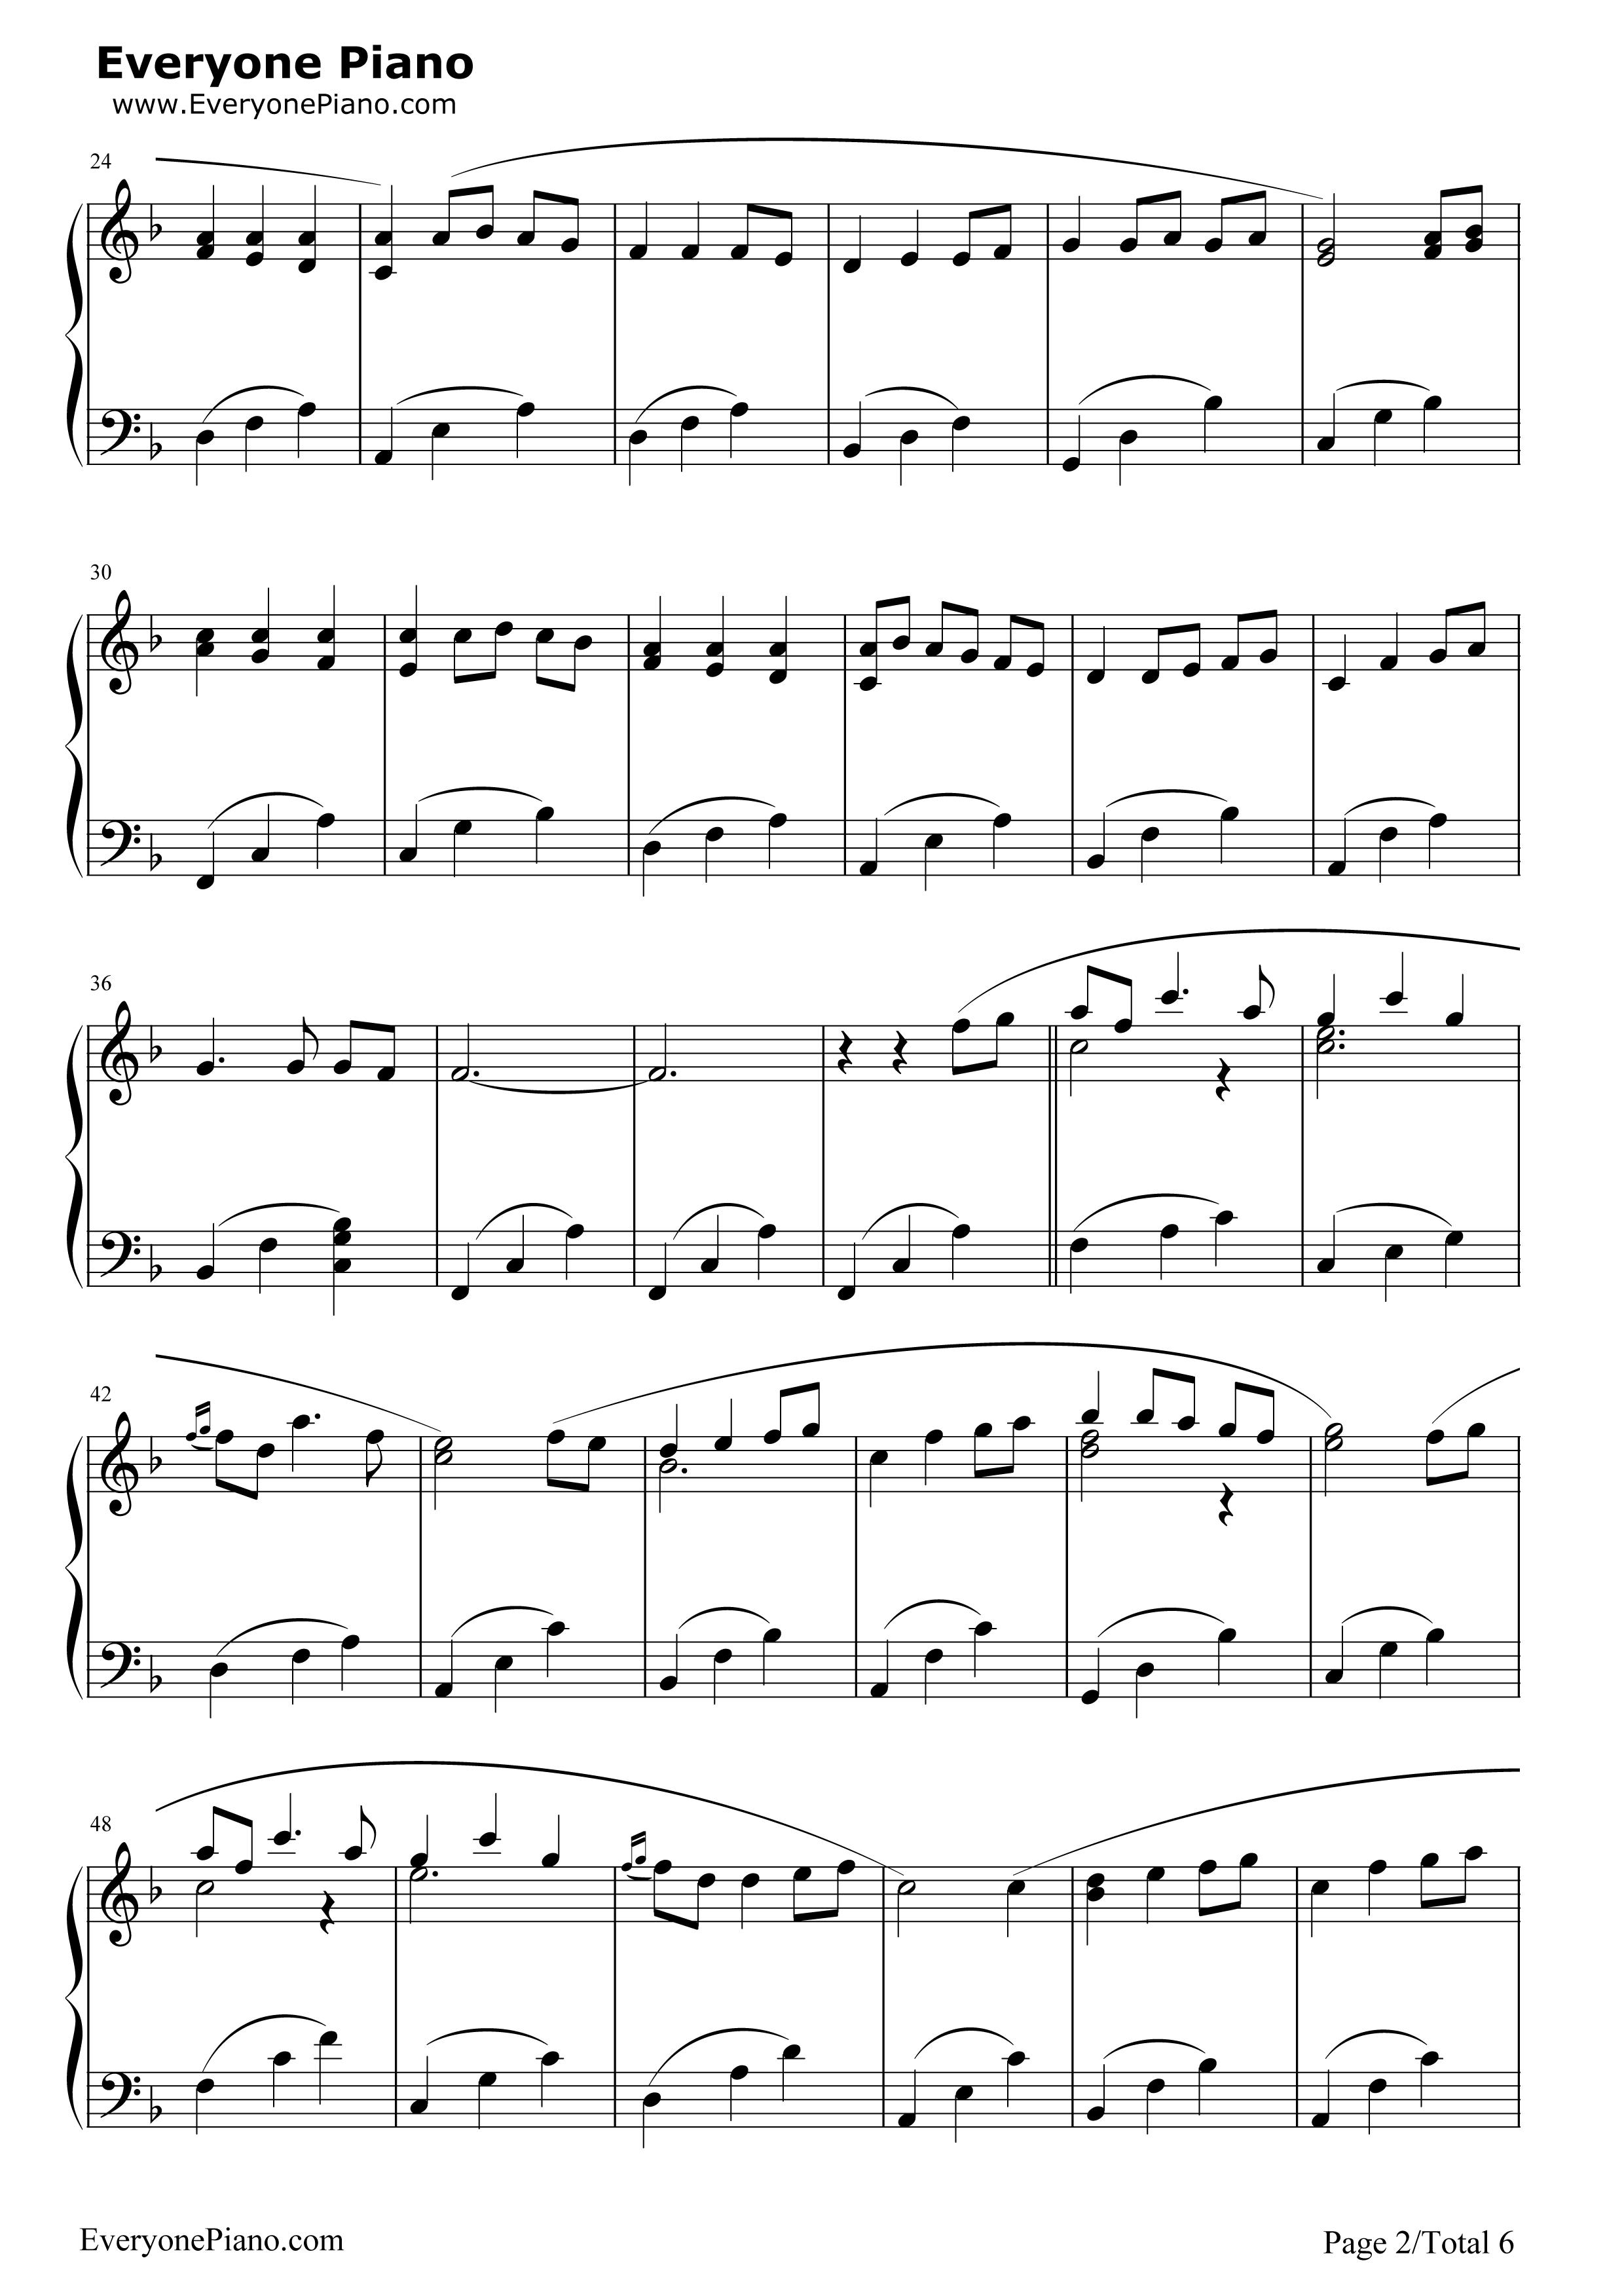 Always with Me 千与千寻片尾曲五线谱预览2 钢琴谱文件 五线谱 双手简